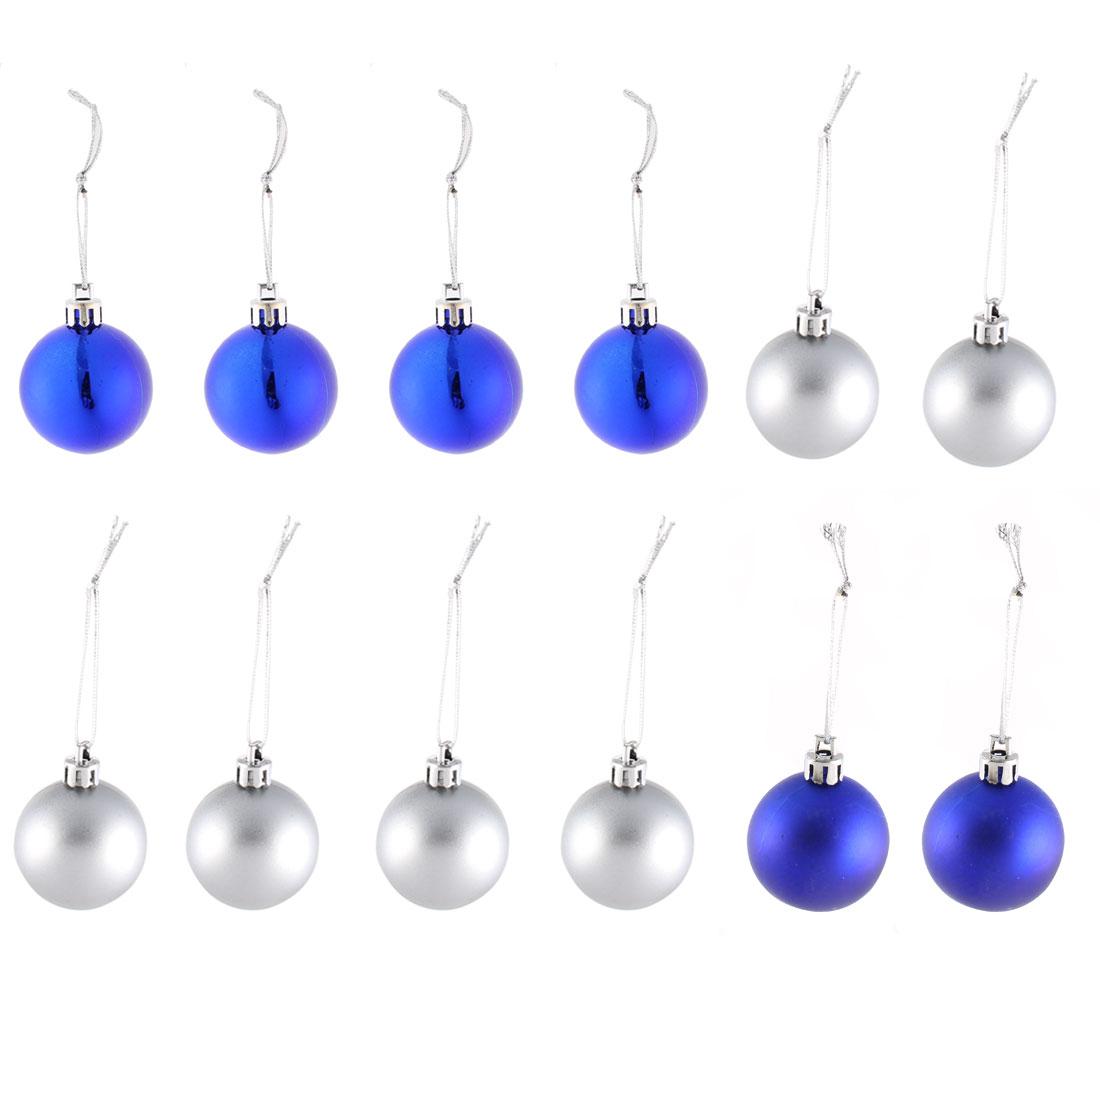 Christmas Party Plastic Hanging Decor Baubles Home Ornament Balls 12pcs